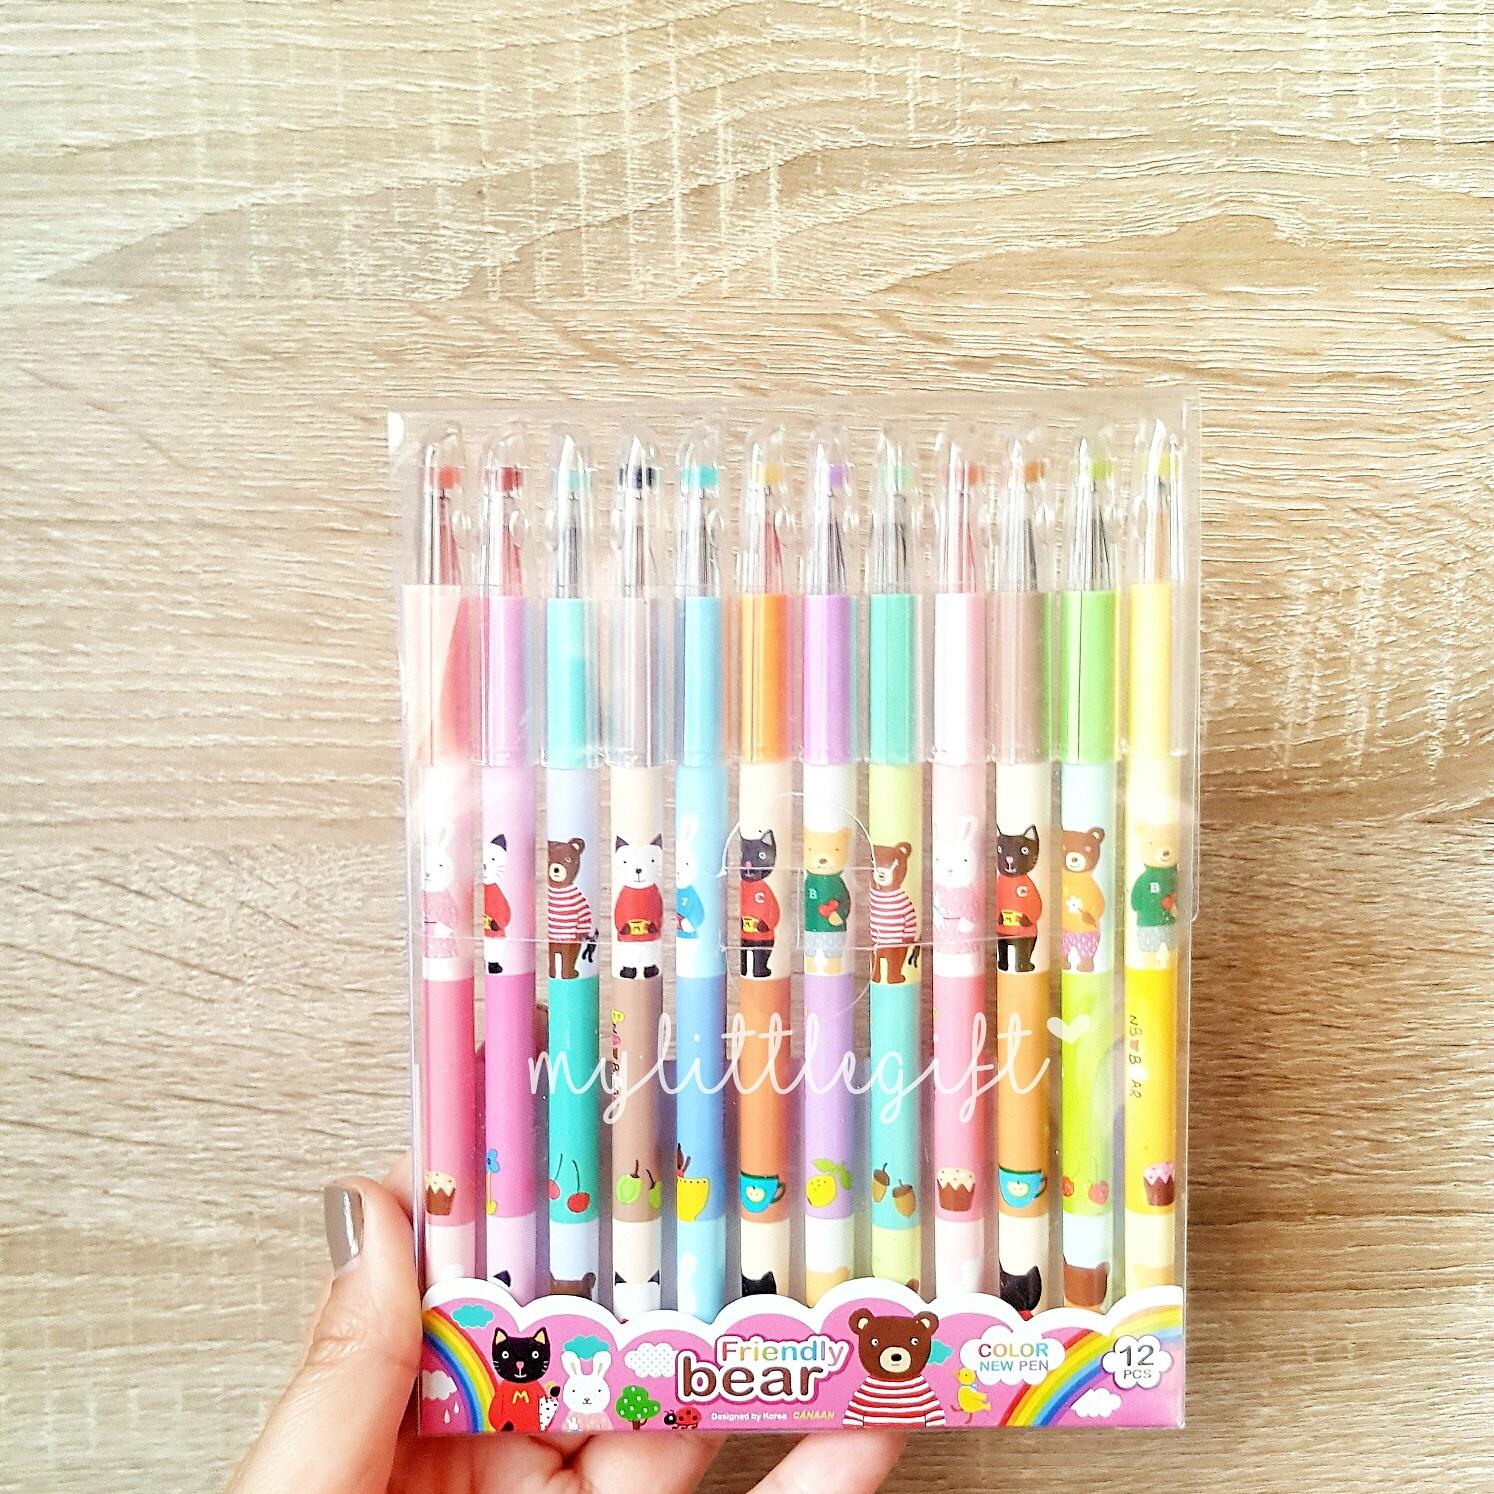 Friendly Bear Color Gel Pen ปากกาหมึกเจลลายน้องหมี 12สี